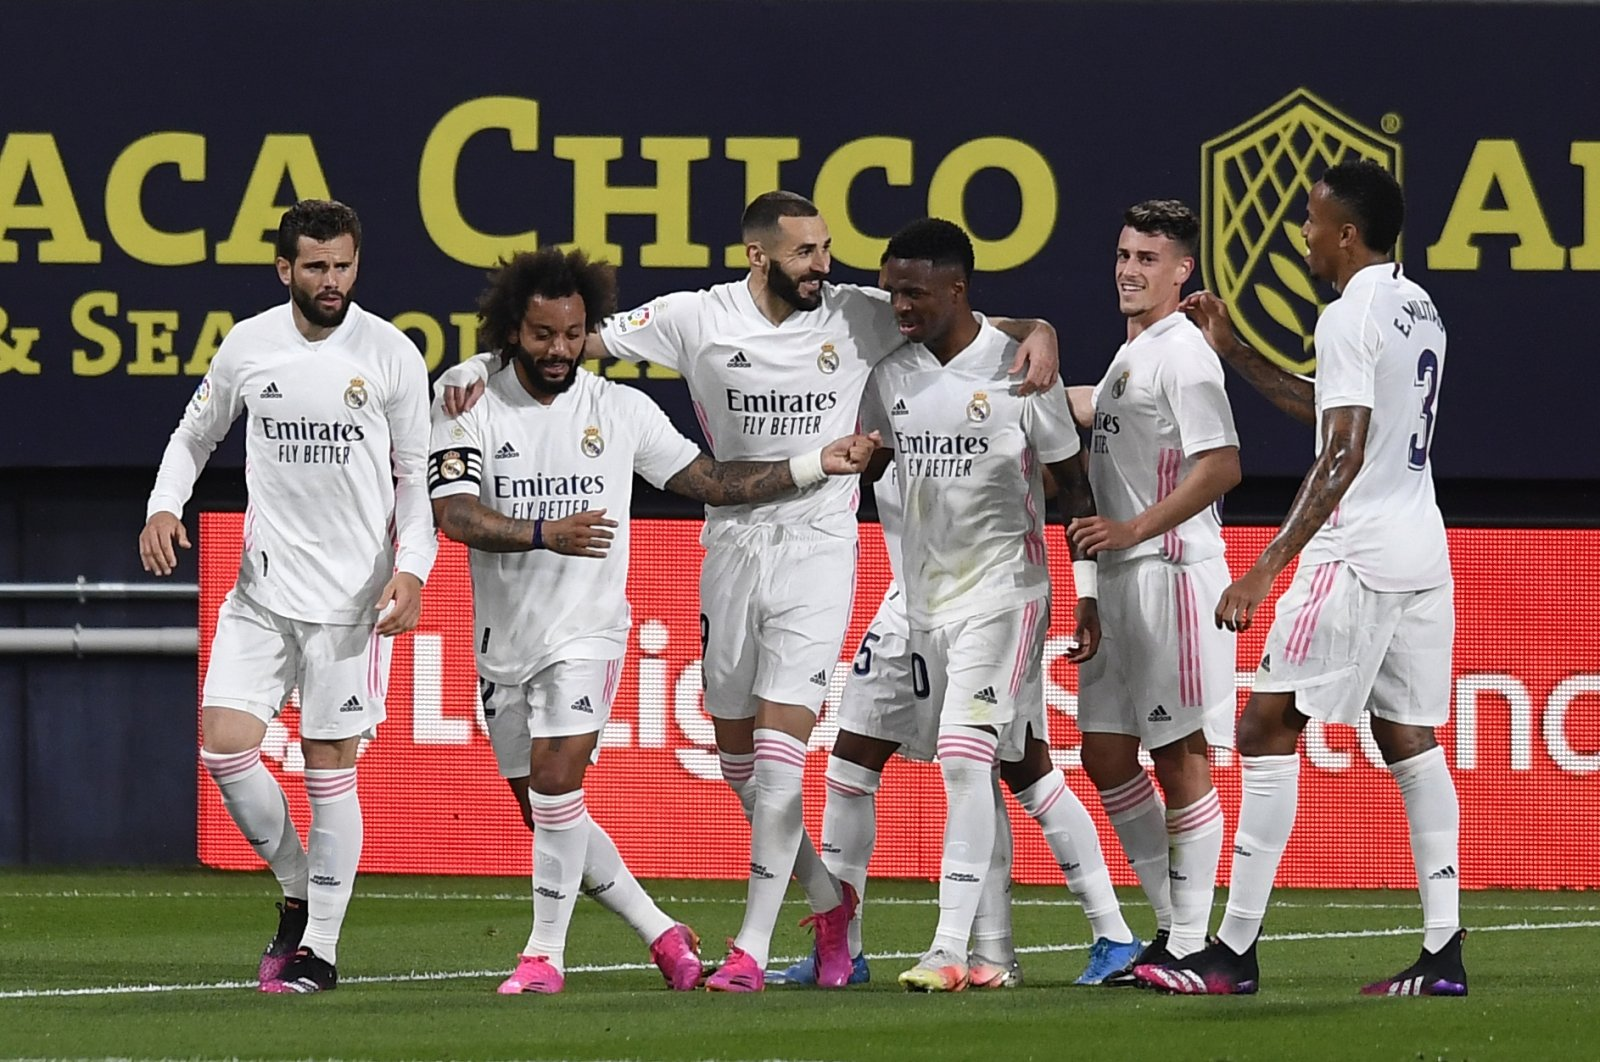 Real Madrid's players celebrate a goal during a La Liga match against Cadiz at the Ramon Carranza stadium in Cadiz, Spain, April 21, 2021. (AP Photo)